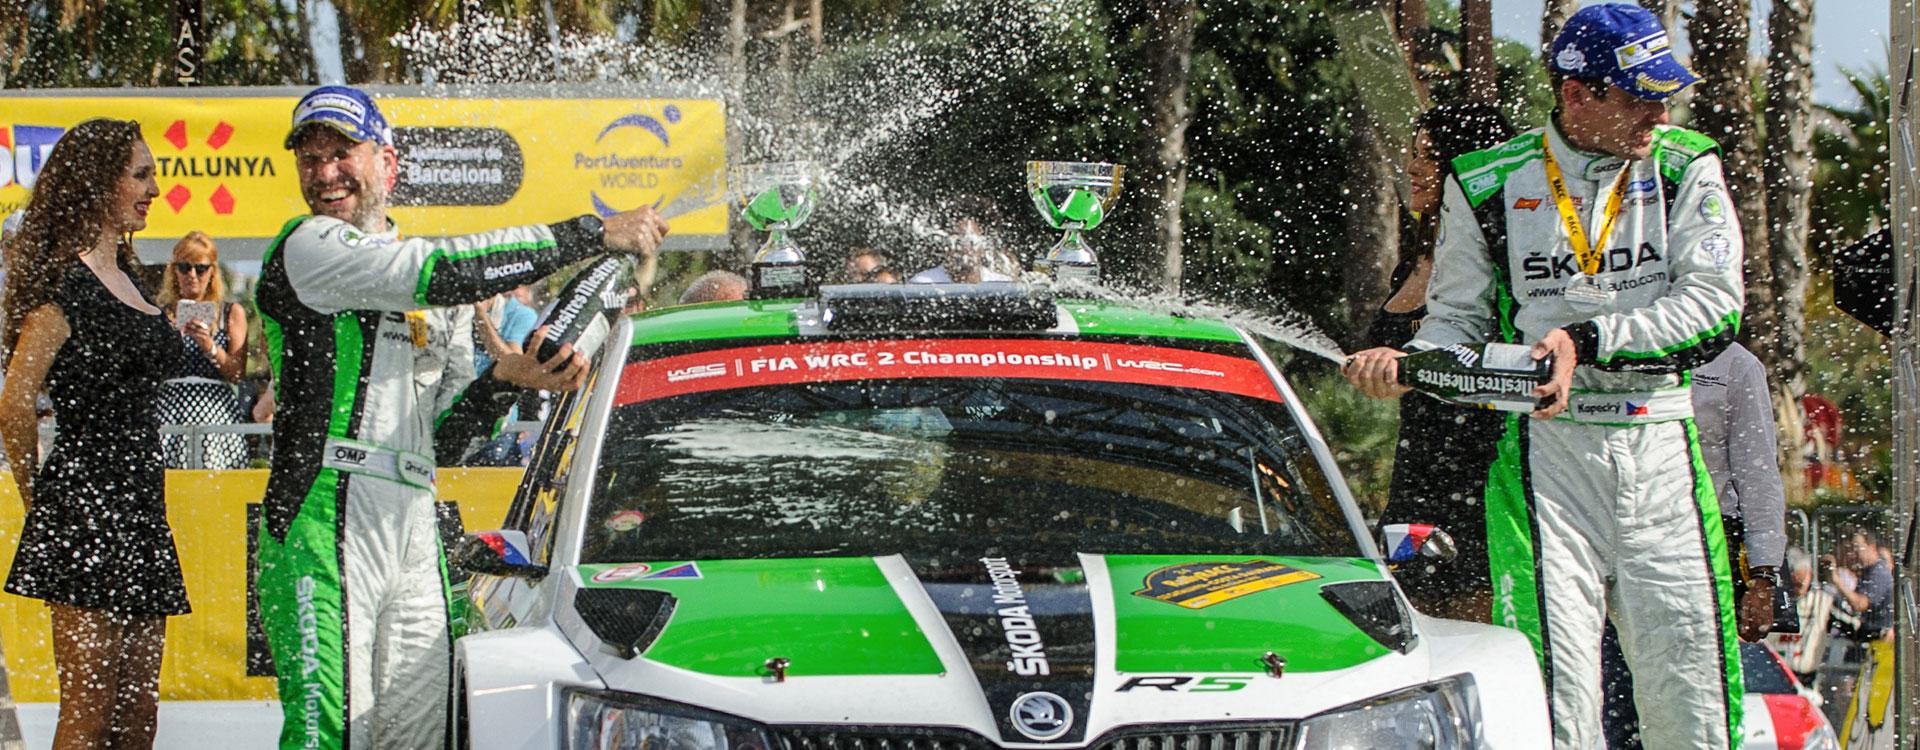 WRC Spain: ŠKODA Motorsport repeats 2015 one-two victory